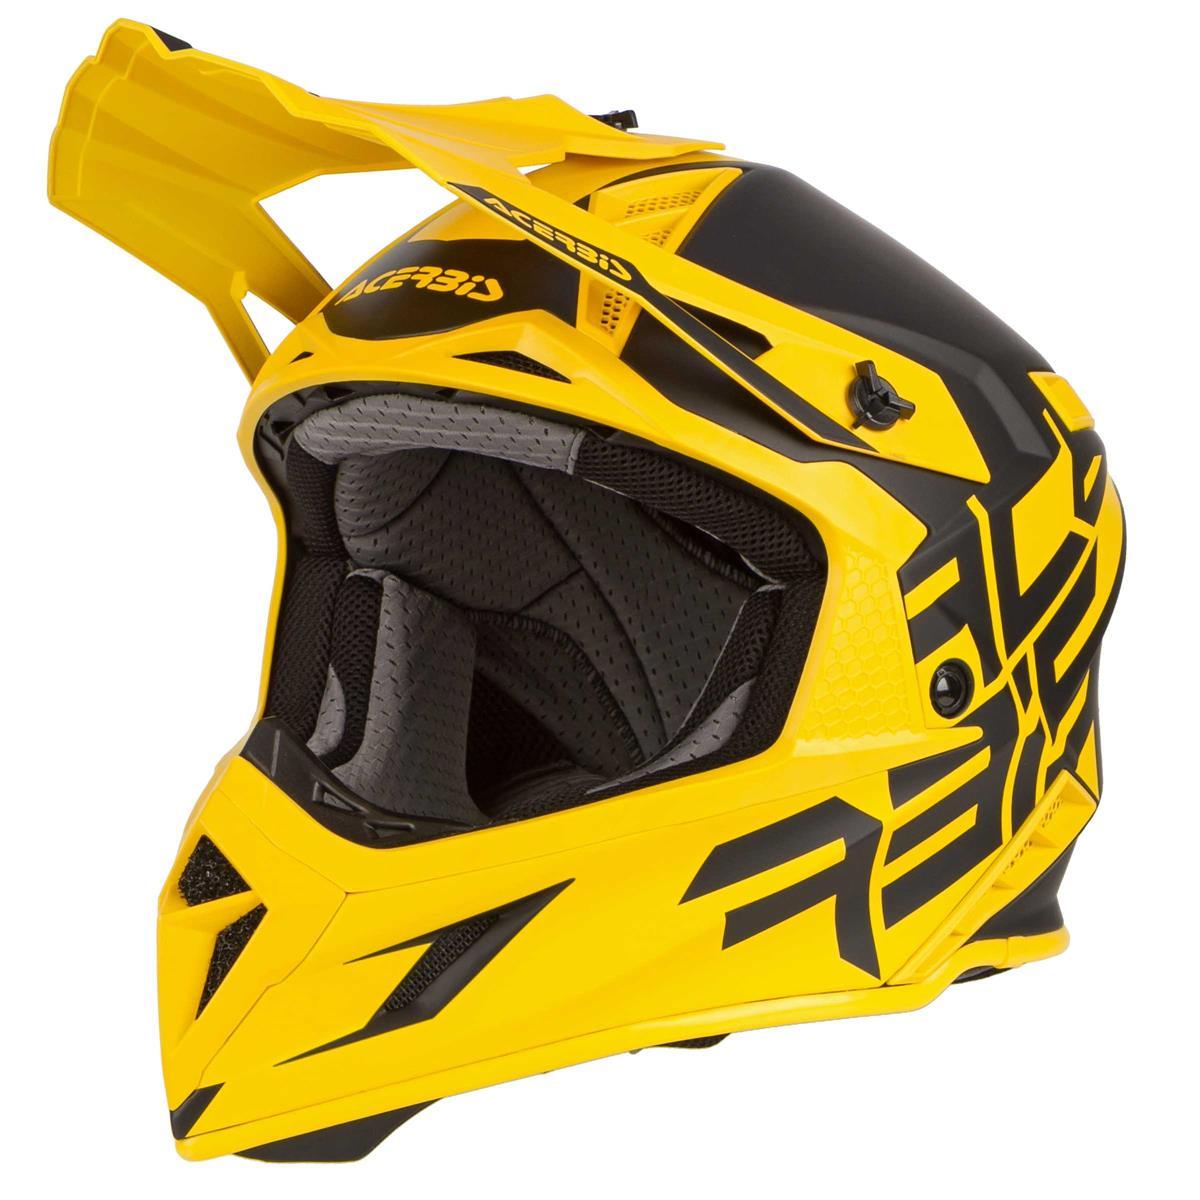 Acerbis Helm X Pro VTR Schwarz/Gelb